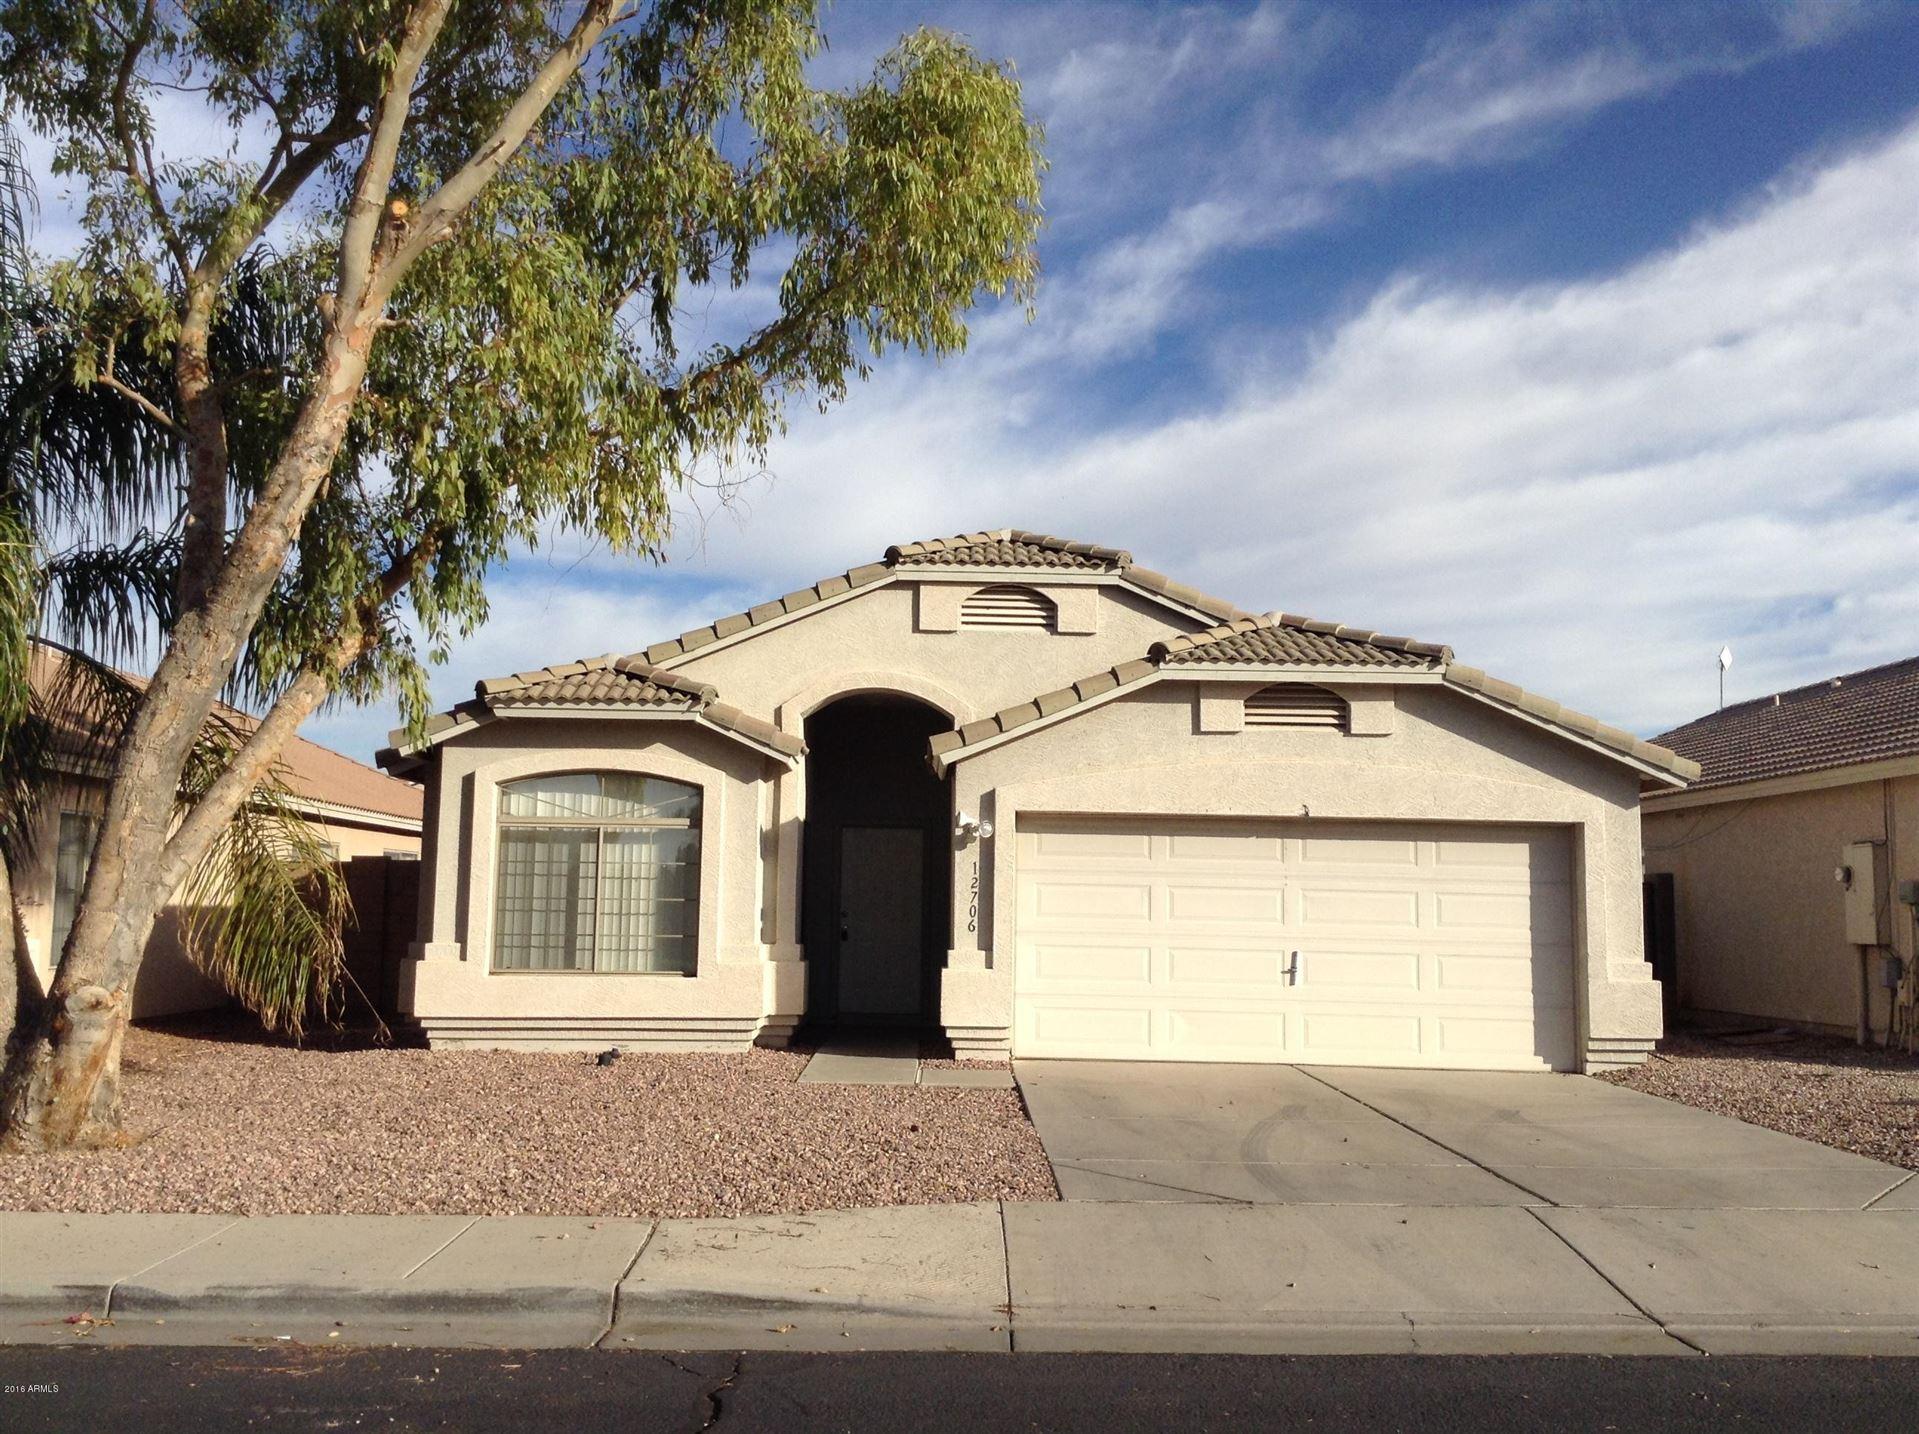 Photo of 12706 W ASH Street, El Mirage, AZ 85335 (MLS # 6198002)